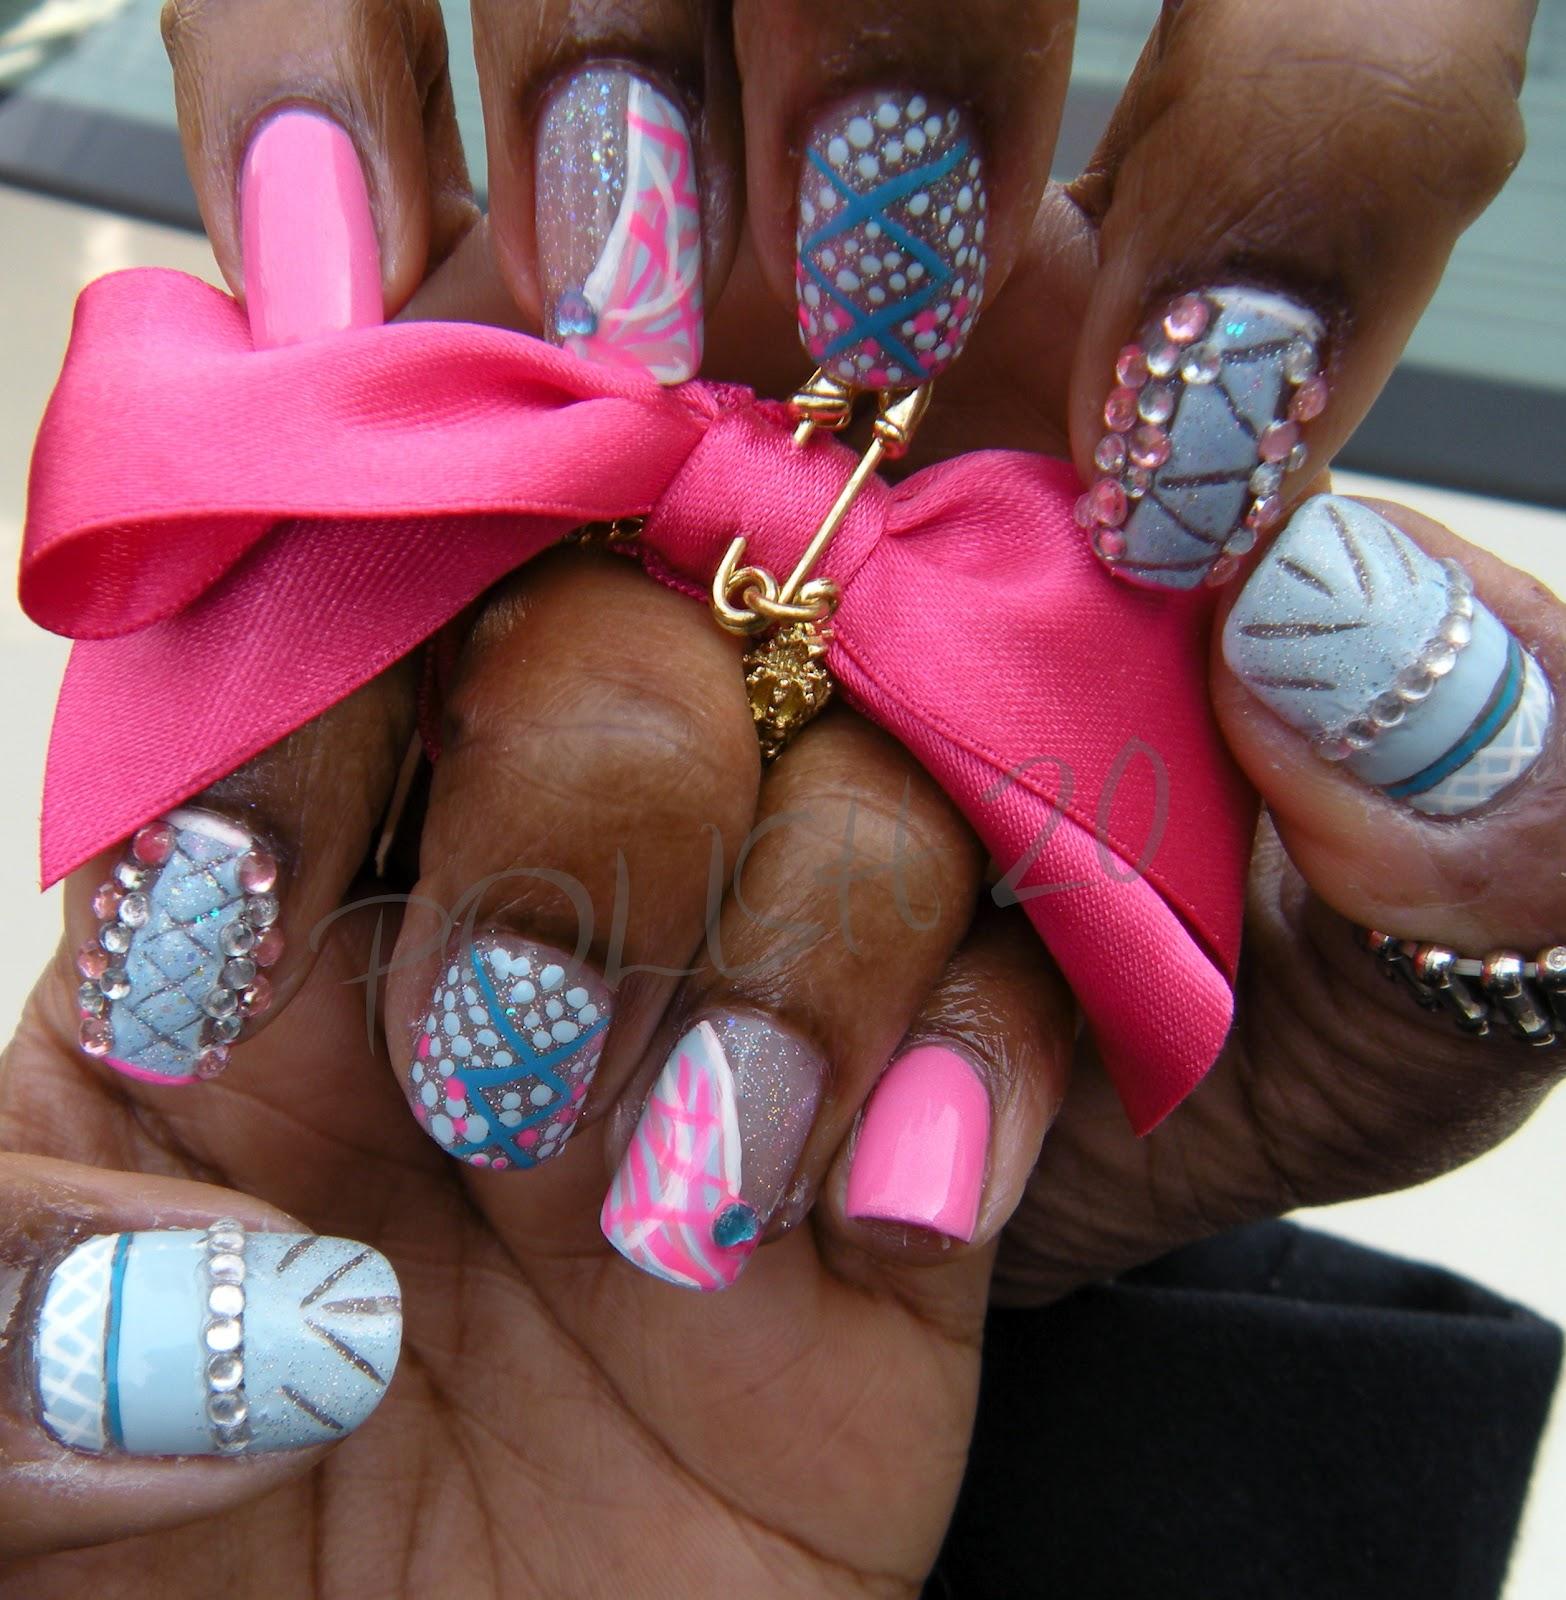 Nicki Minaj Nails Design